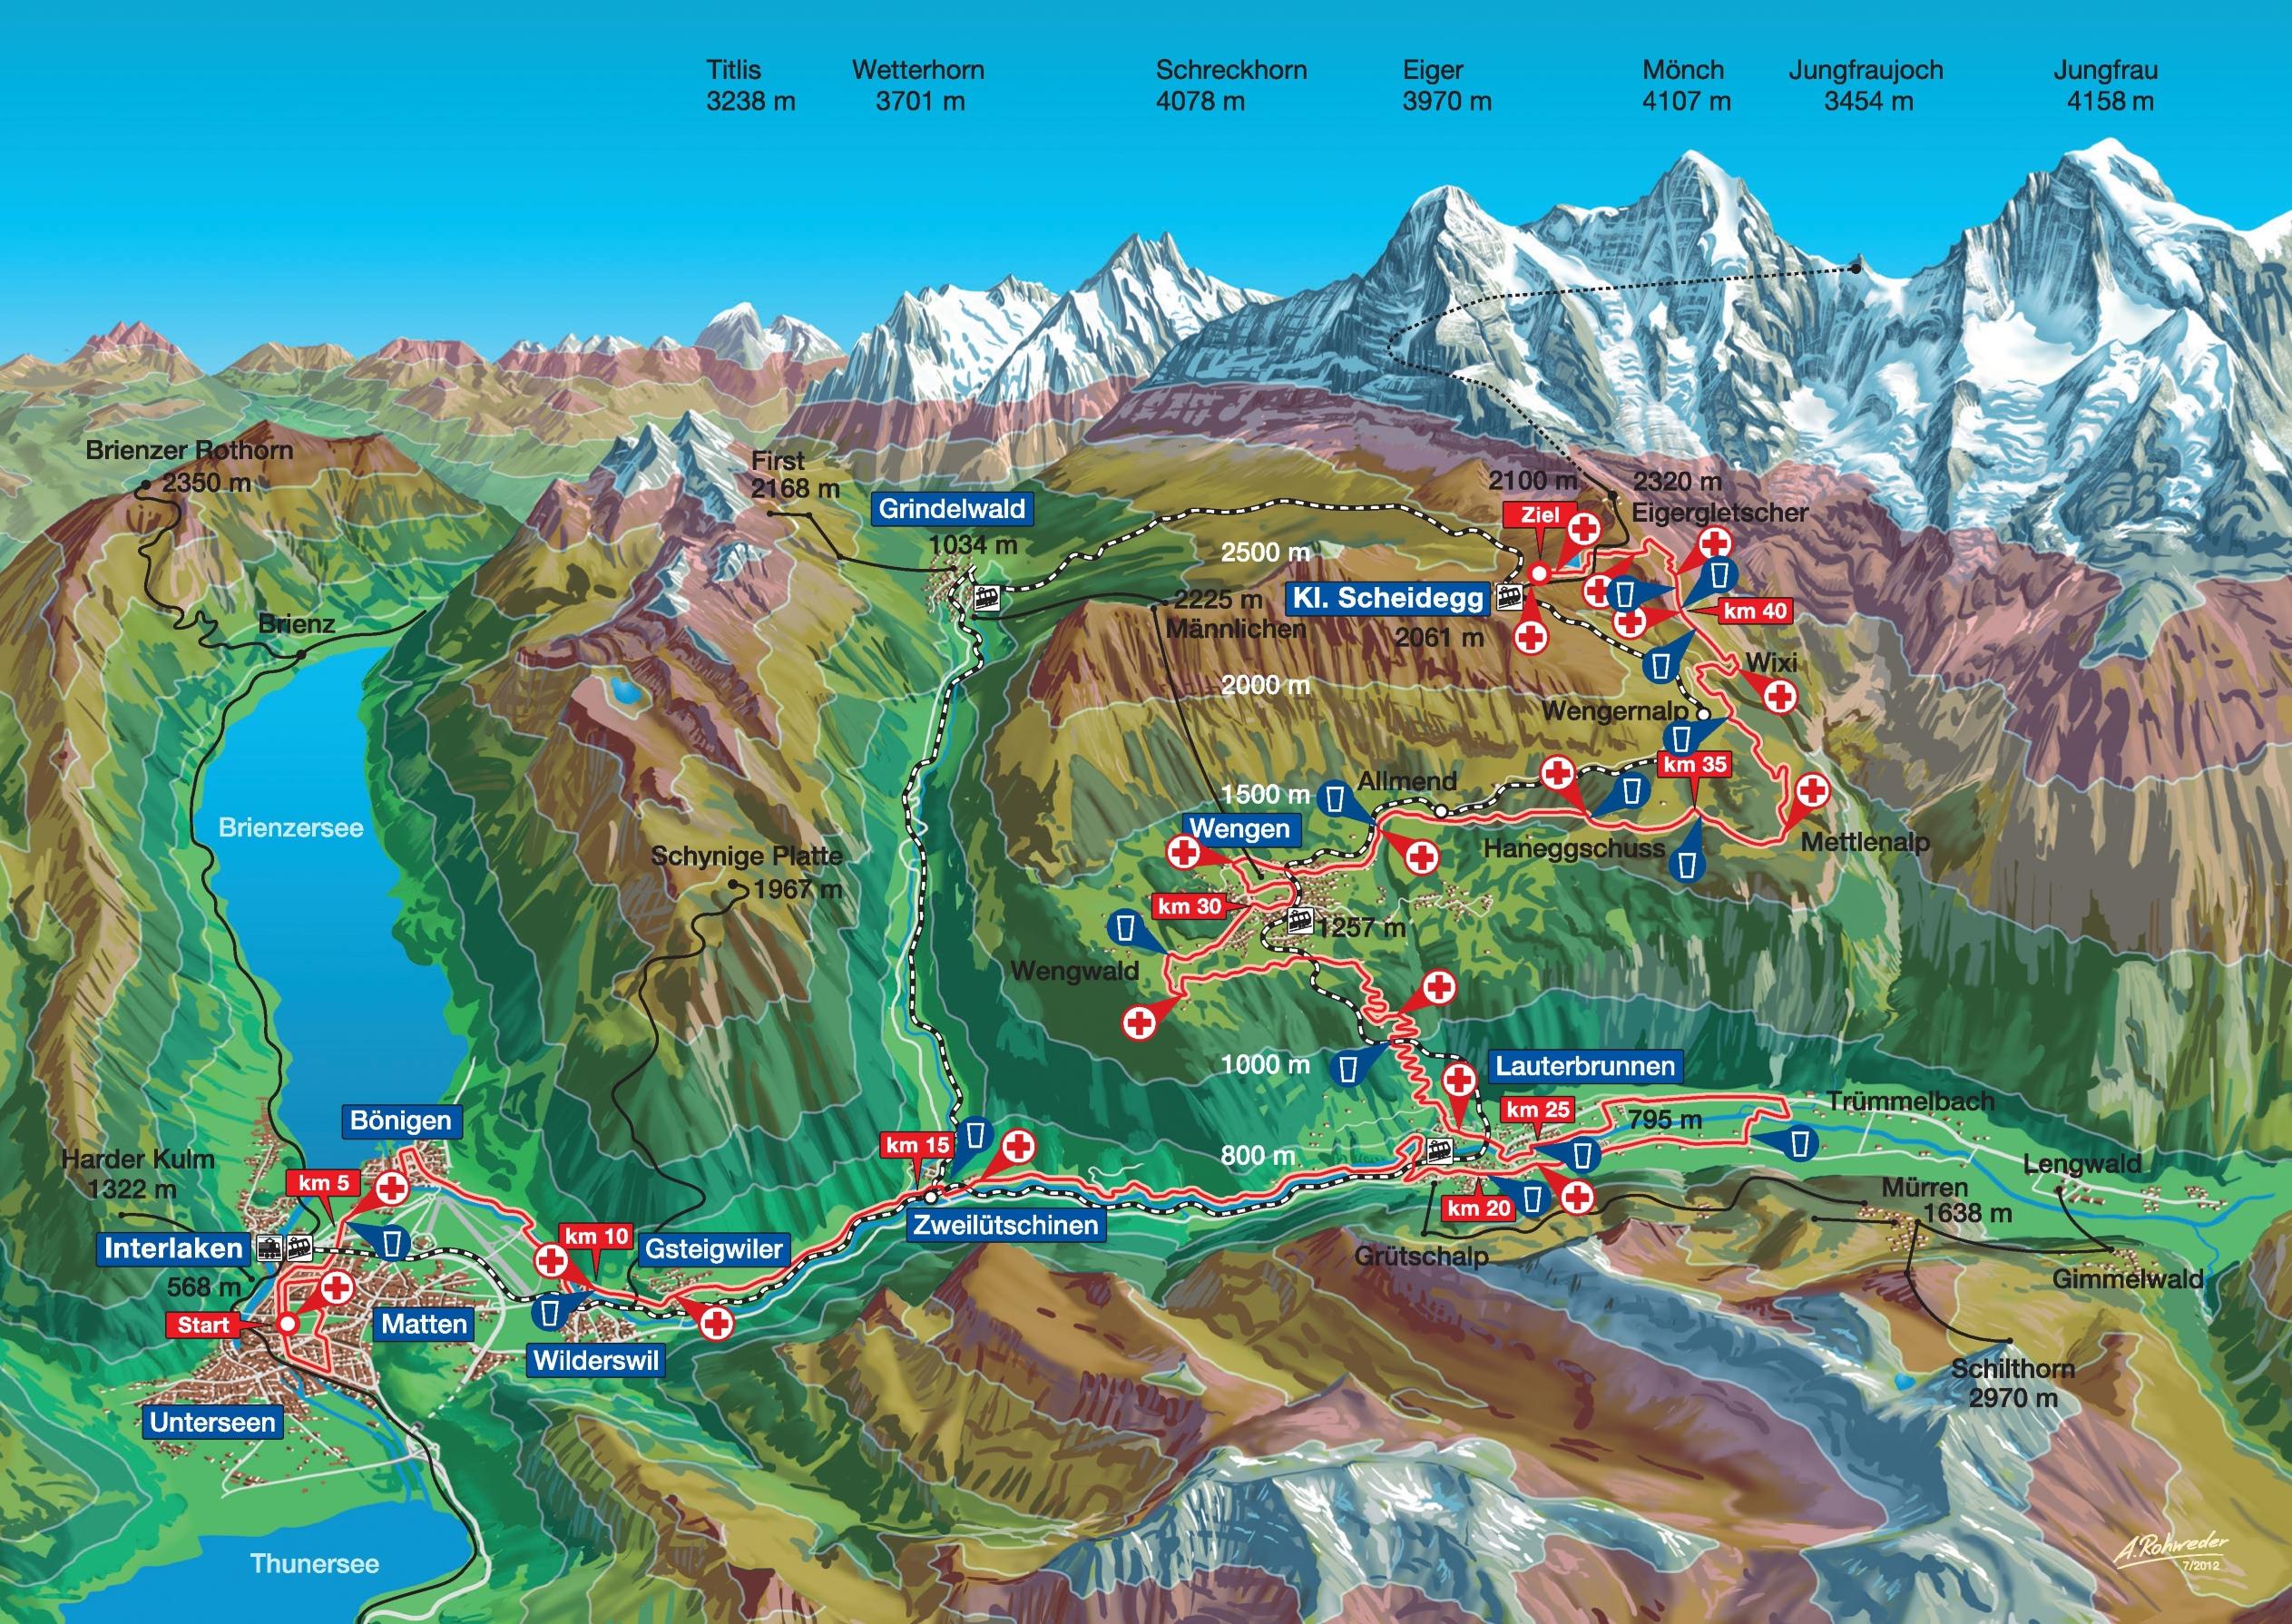 Jungfrau Maps Switzerland Maps of Jungfrau